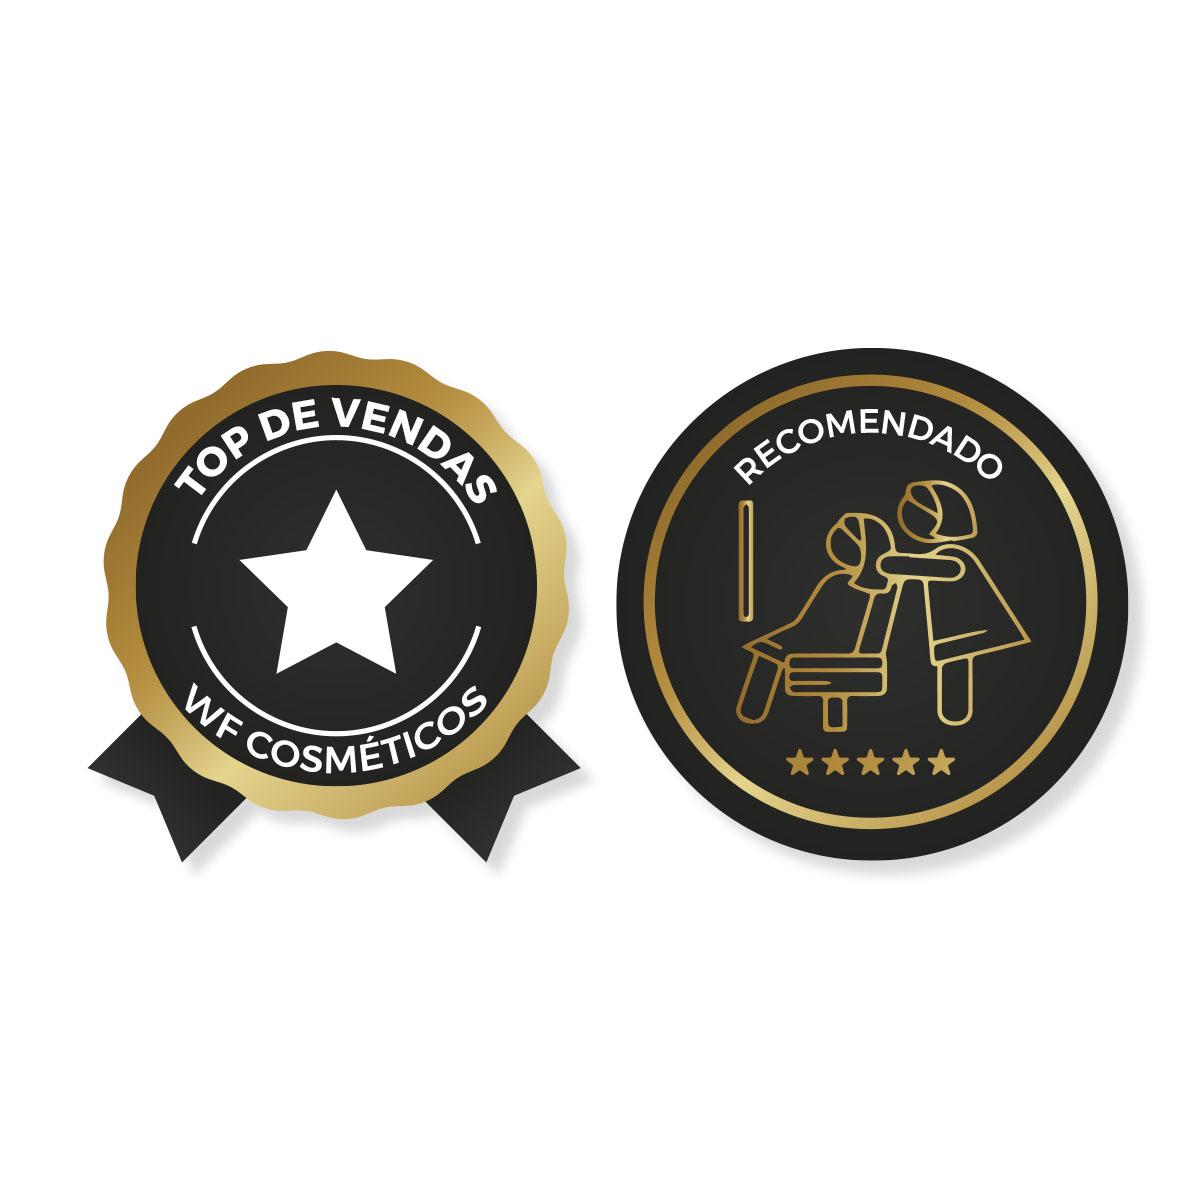 ALL REPAIR - SHAMPOO ELASTICITY FORCE CONTROL WF COSMETICOS 1,5L